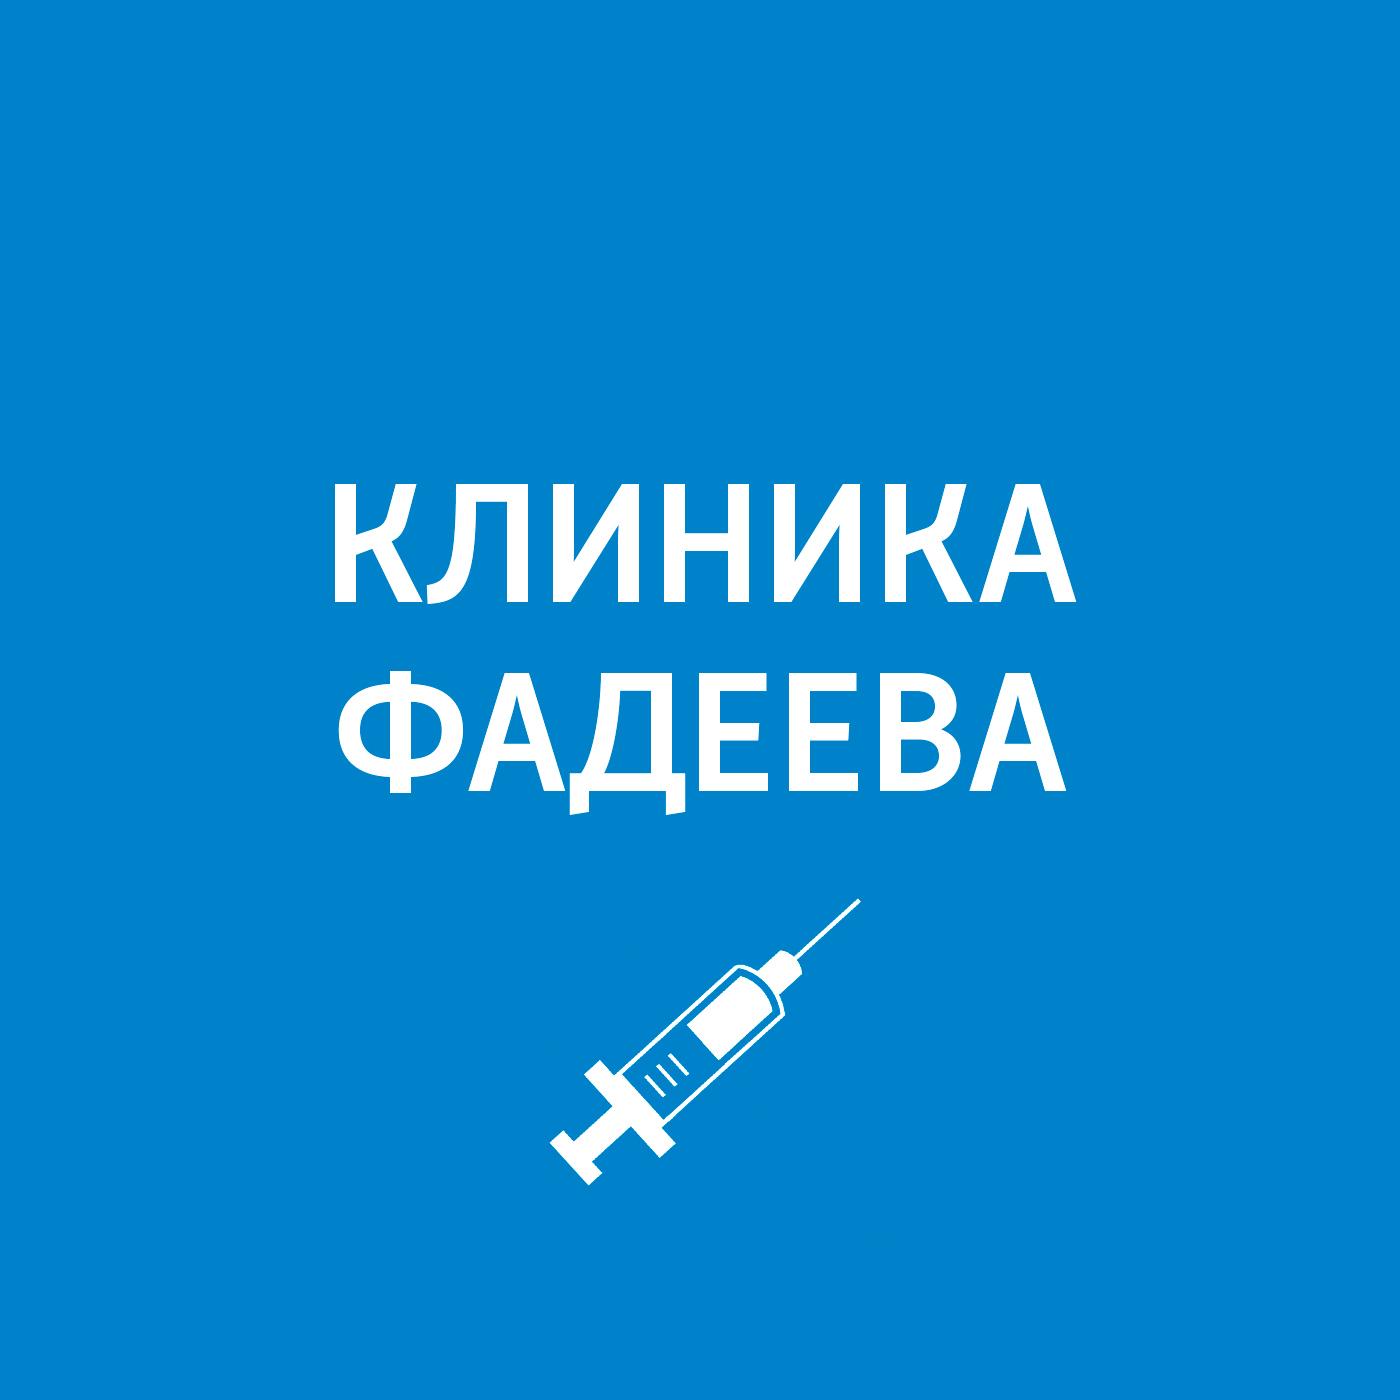 Пётр Фадеев Врач-логопед